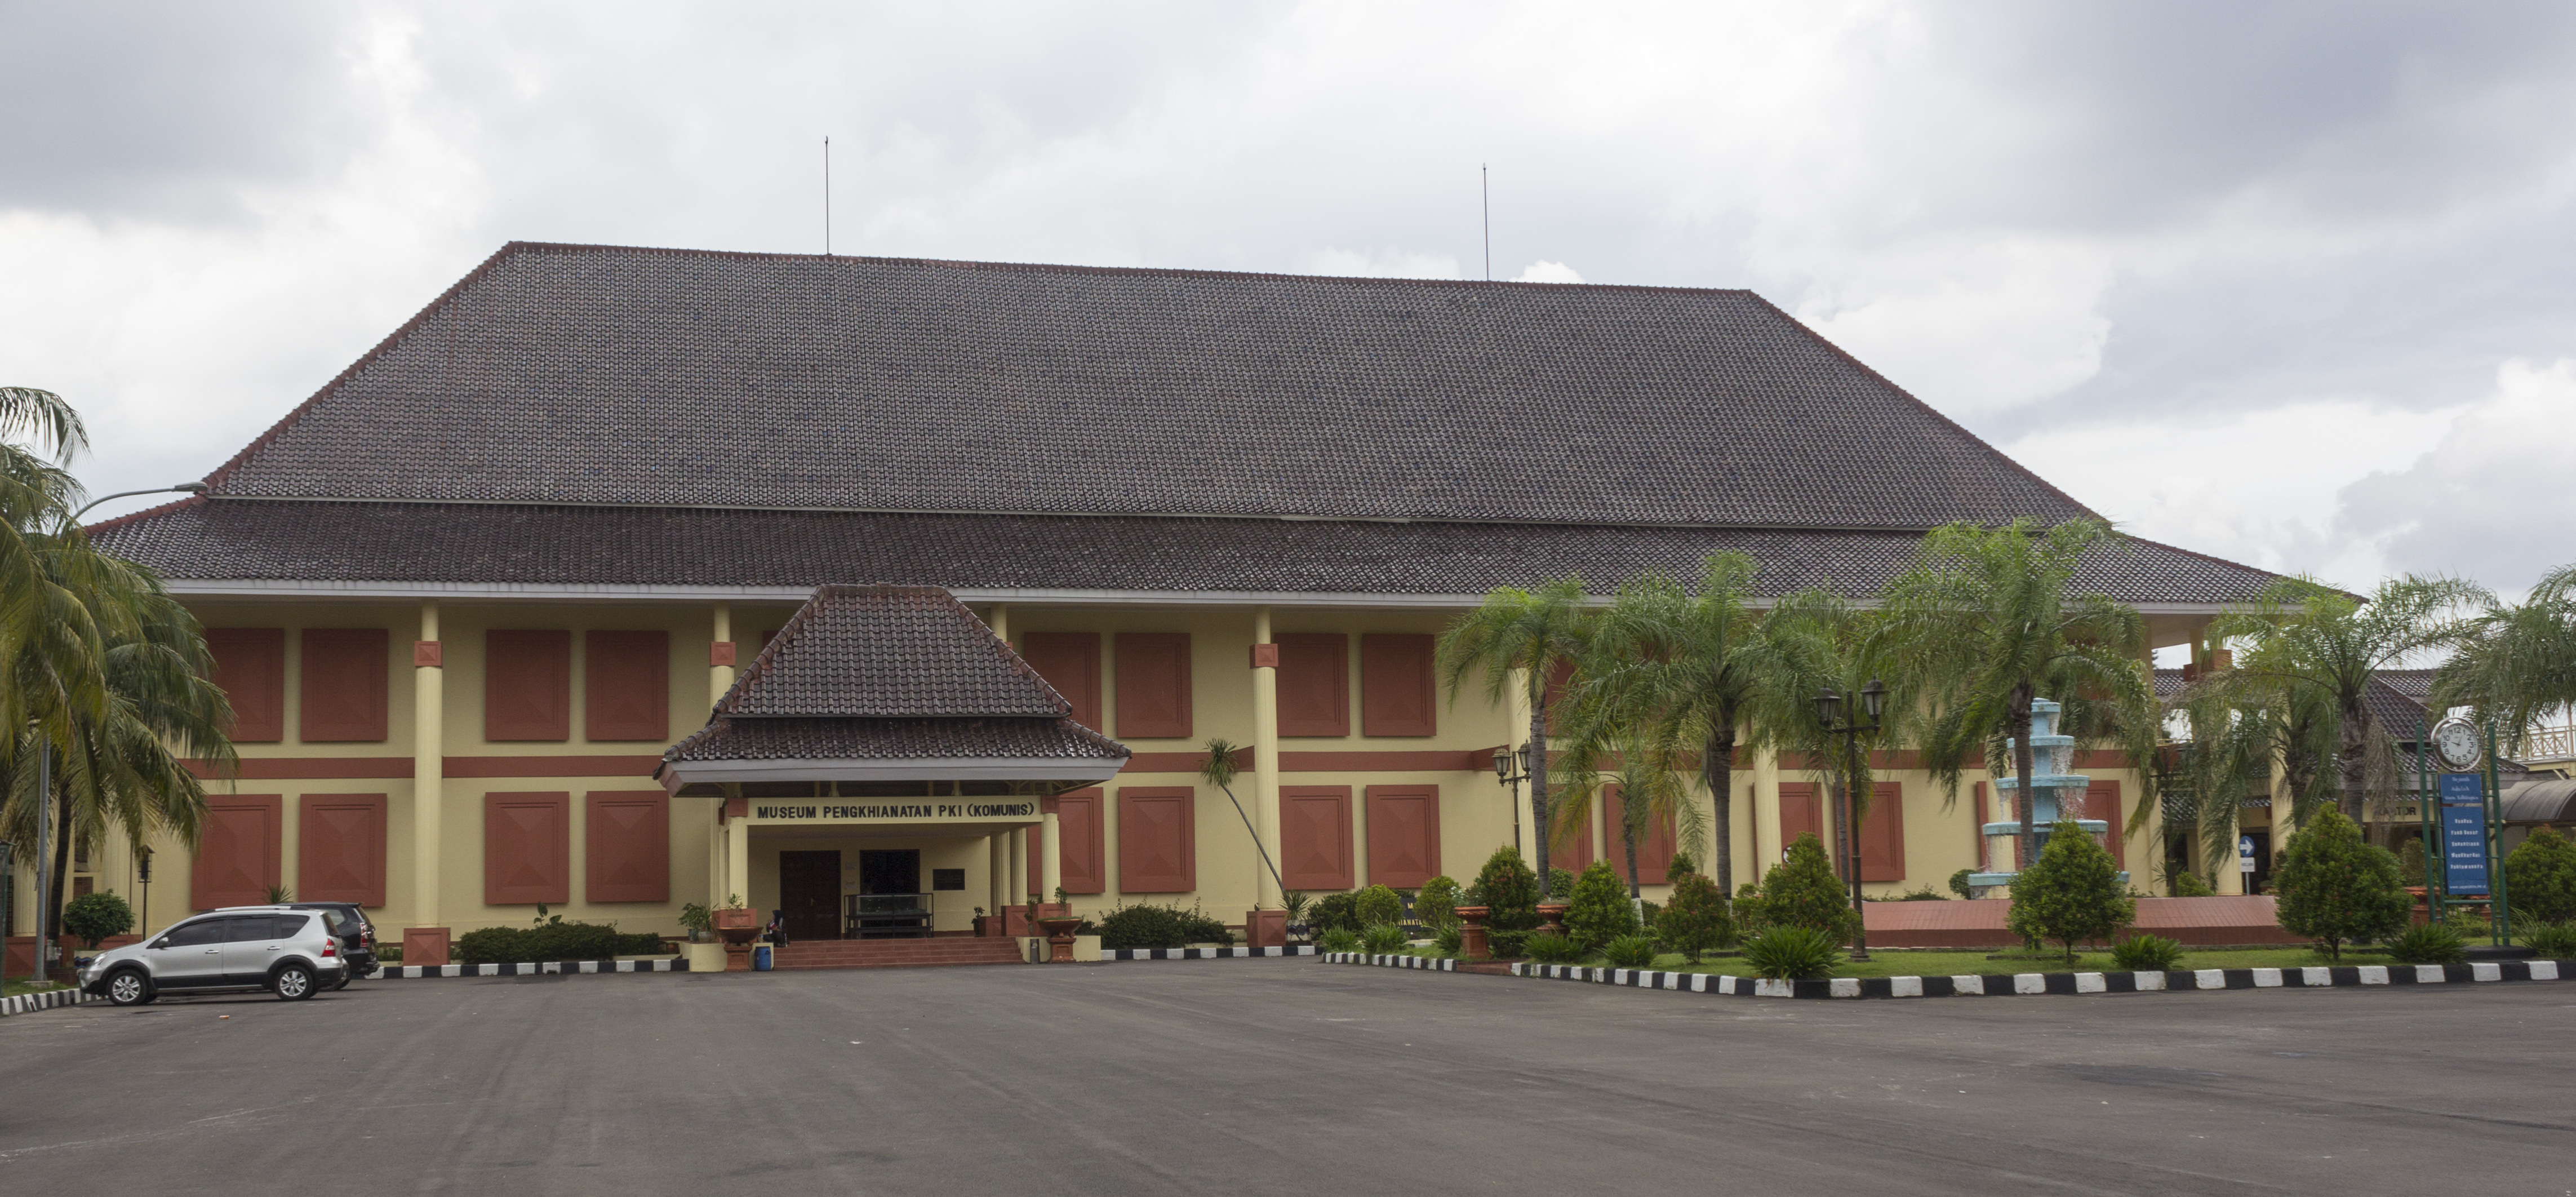 East Jakarta Wikipedia Taman Mini Indonesia Indah Jpg Museum Pki